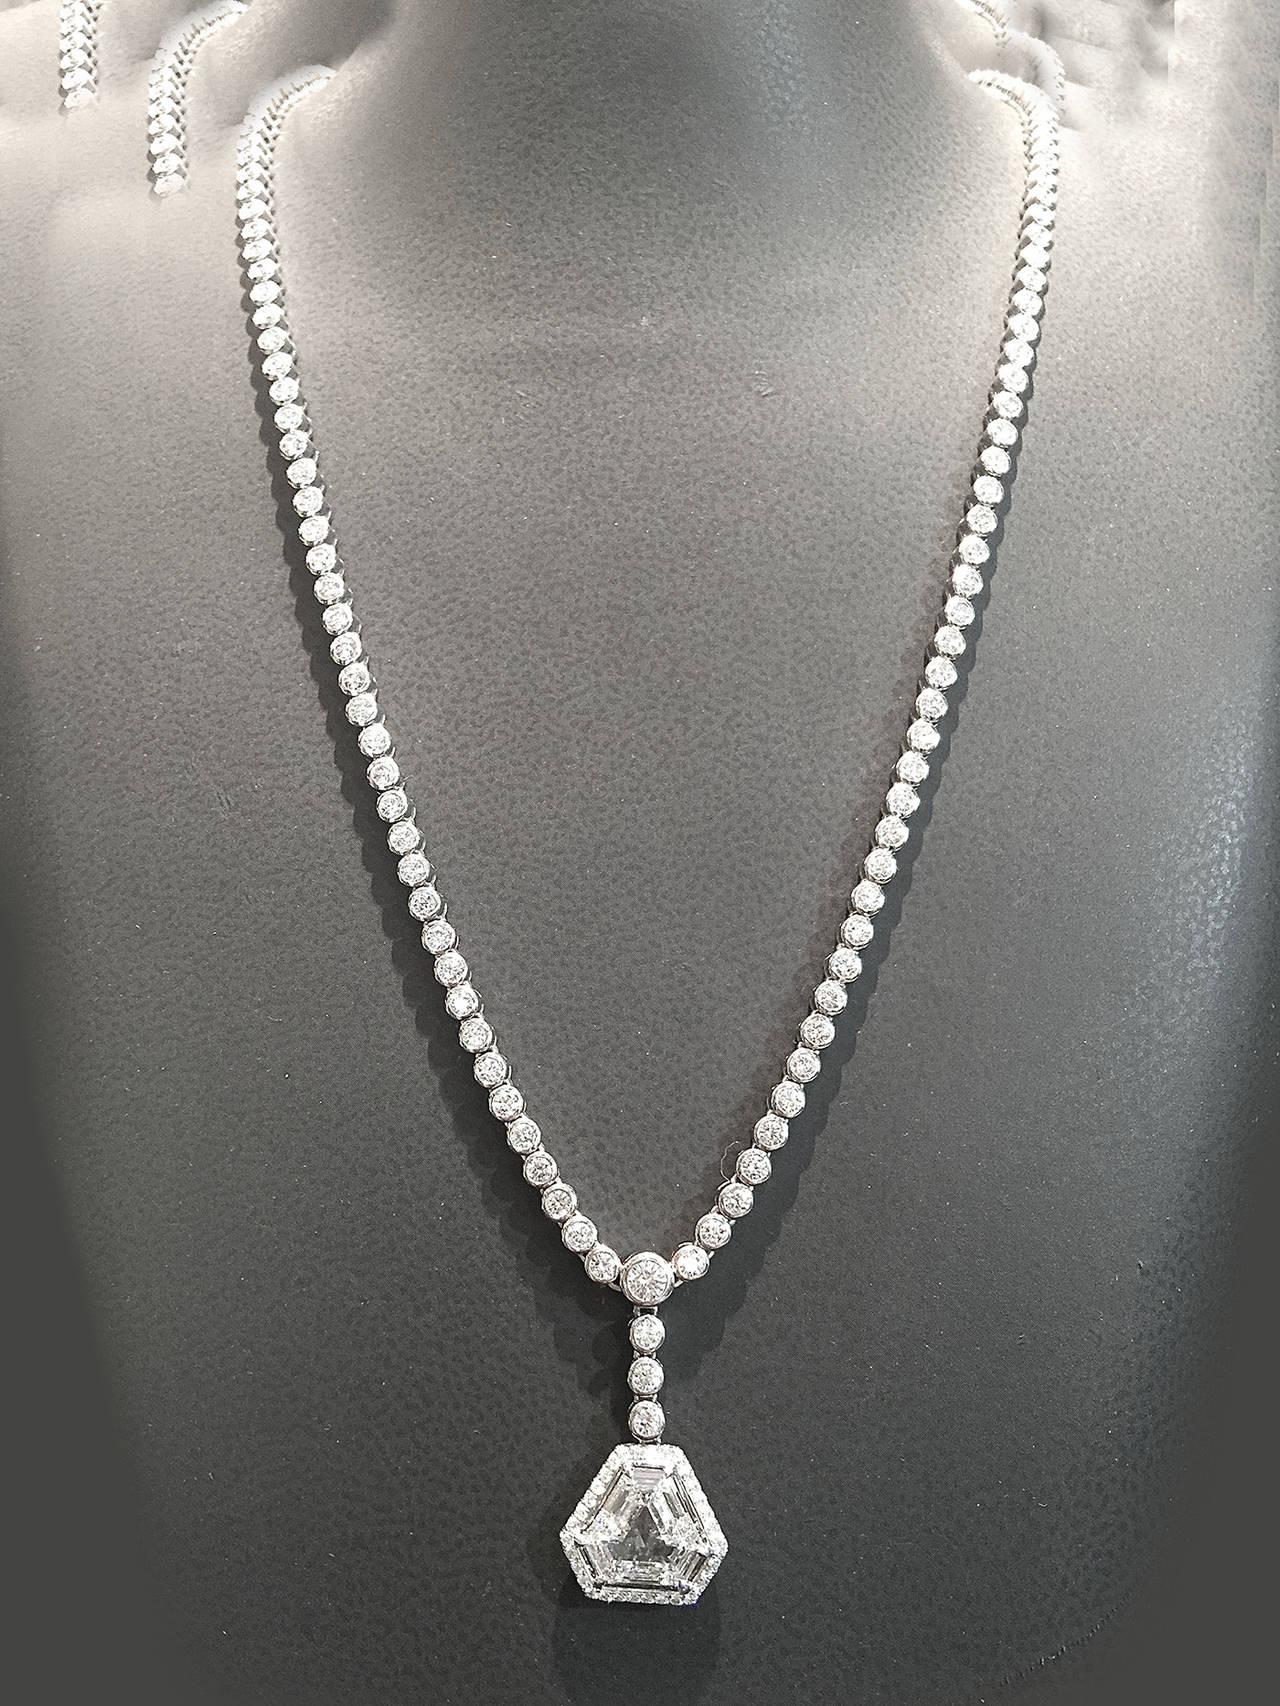 Women's 1.60 Carat GIA Cert Diamond Gold Pendant on Diamond Gold Necklace For Sale